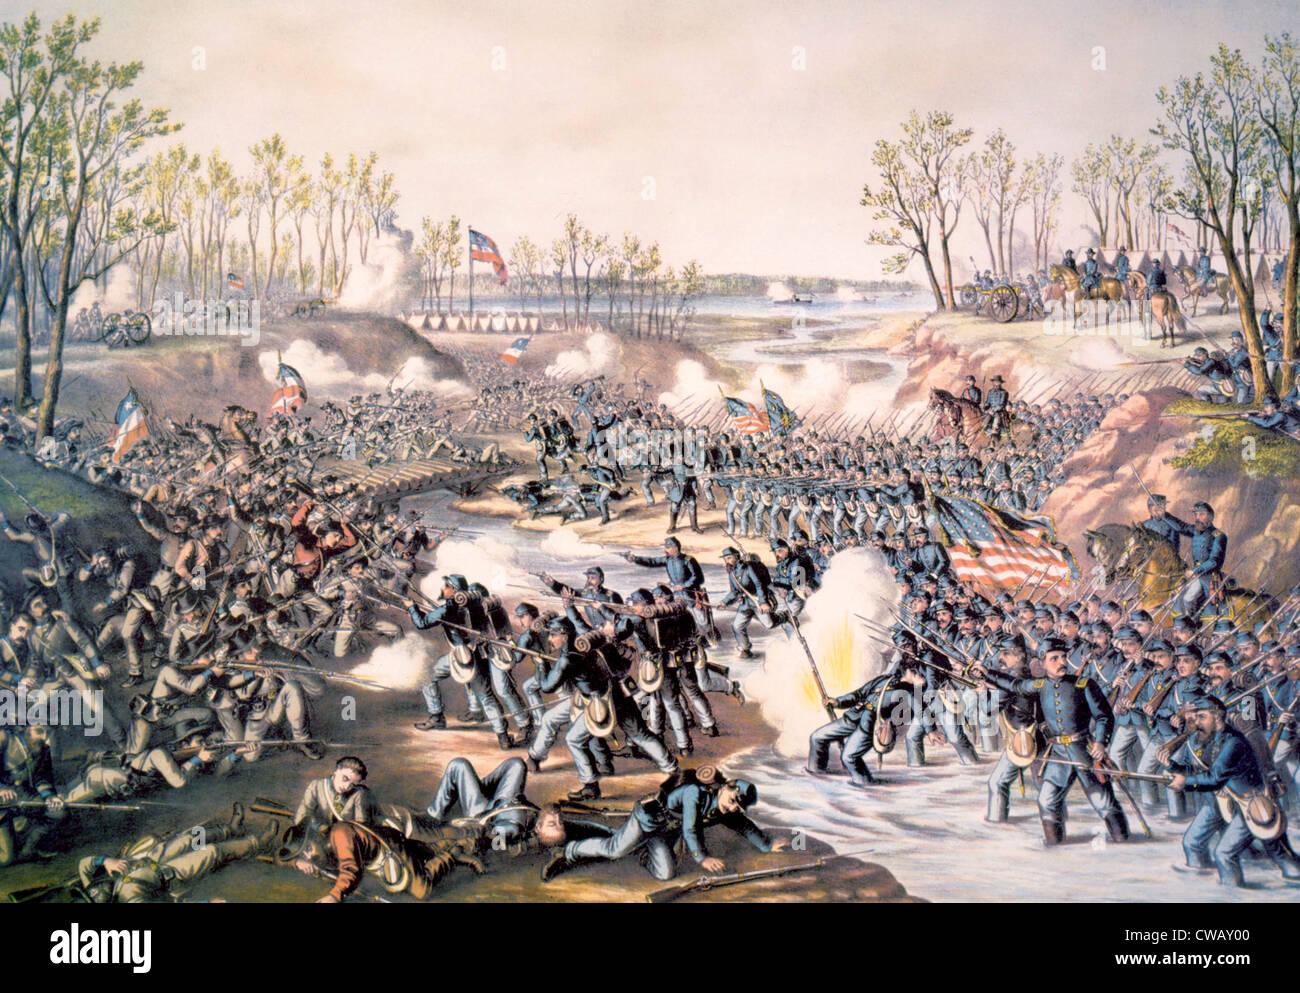 The Battle of Shiloh, April 6-7, 1862, lithograph by Kurz & Allison, 1889 - Stock Image